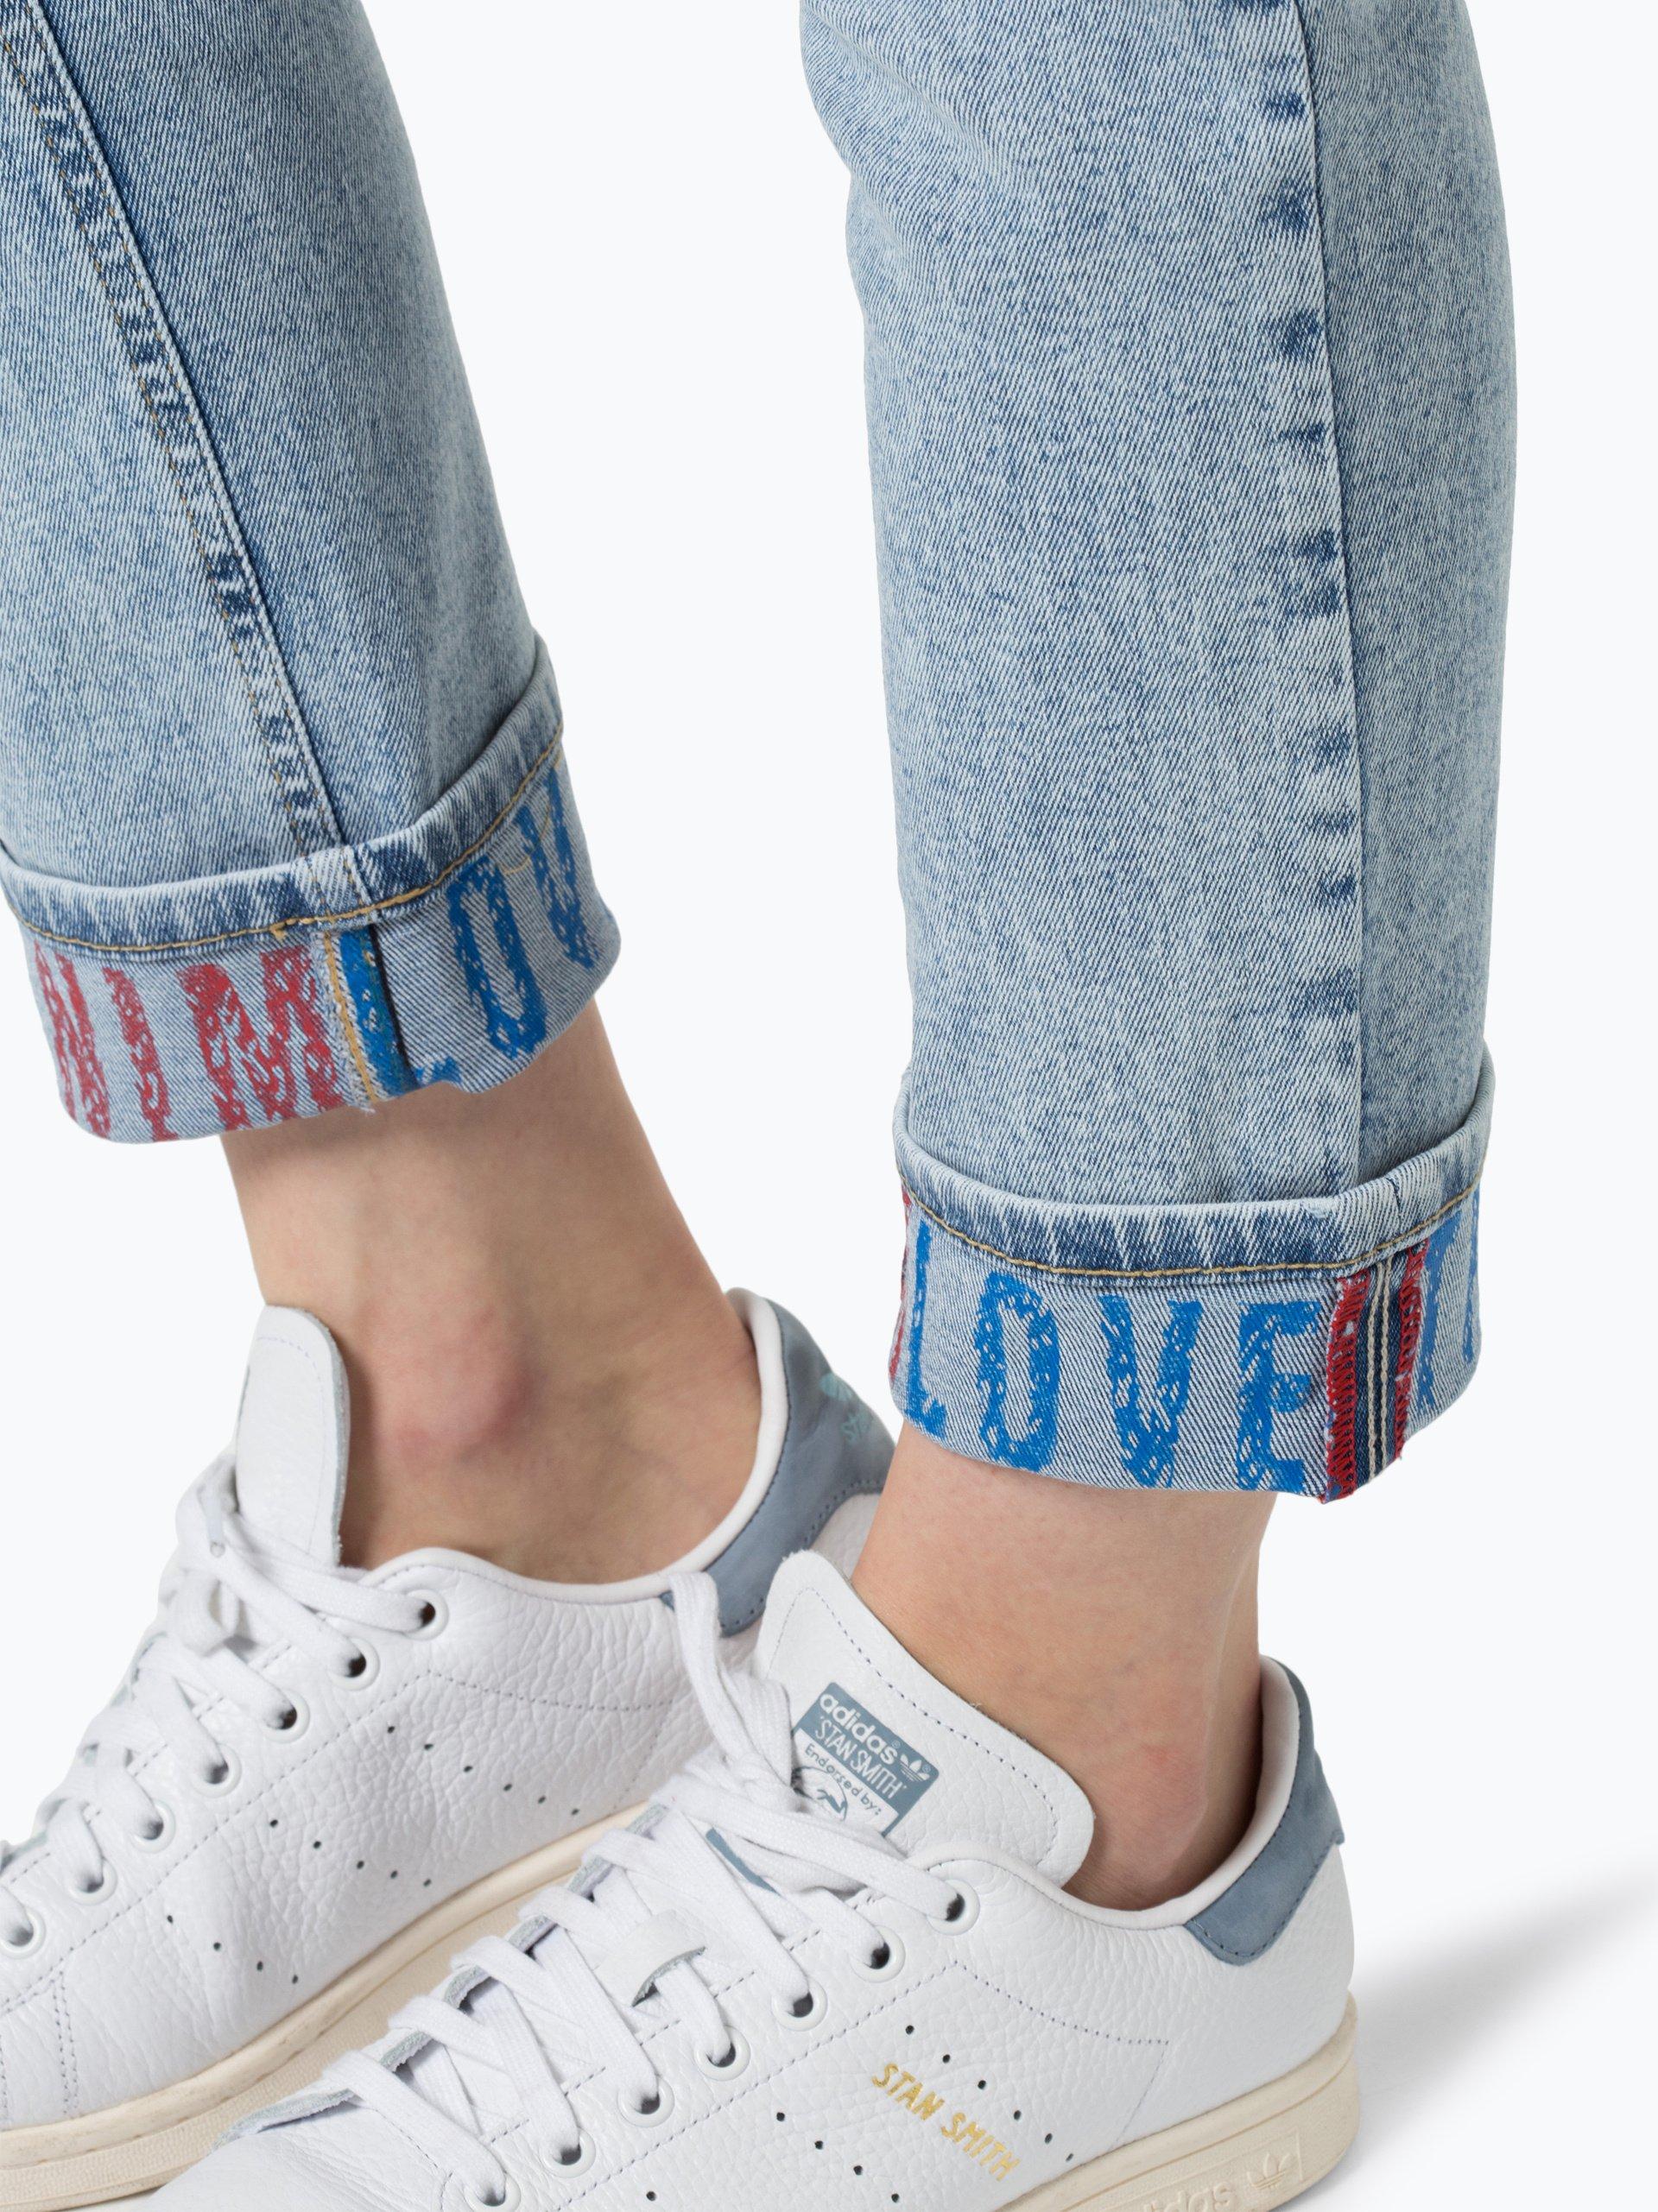 mac damen jeans angela denim uni online kaufen. Black Bedroom Furniture Sets. Home Design Ideas